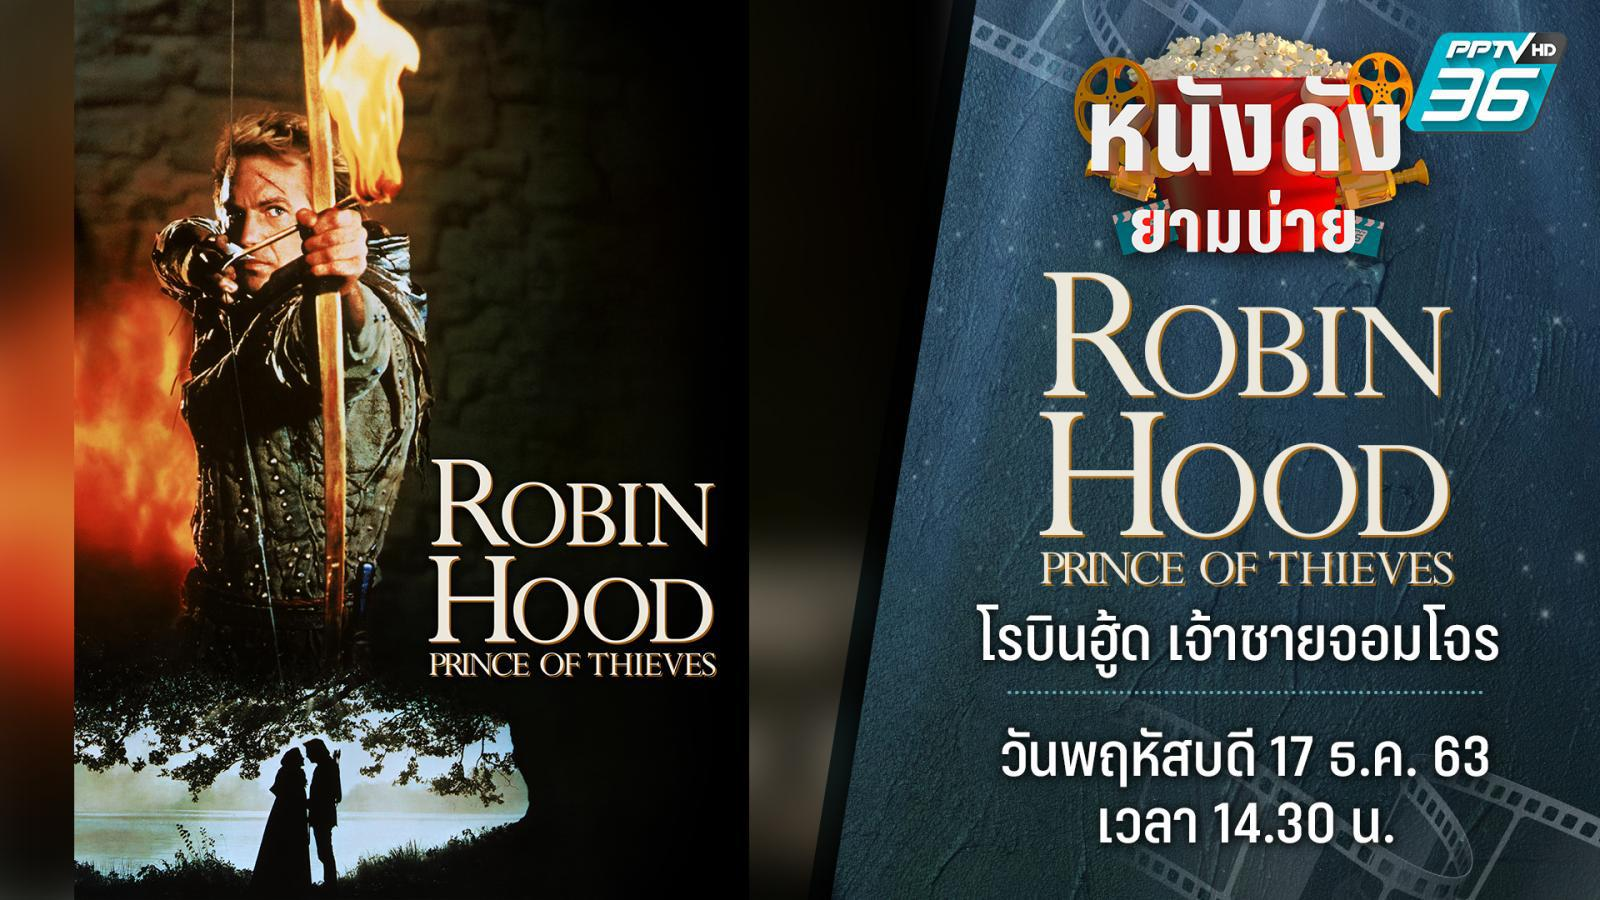 Robin Hood: Prince OF Thieves โรบินฮู้ด เจ้าชายจอมโจร